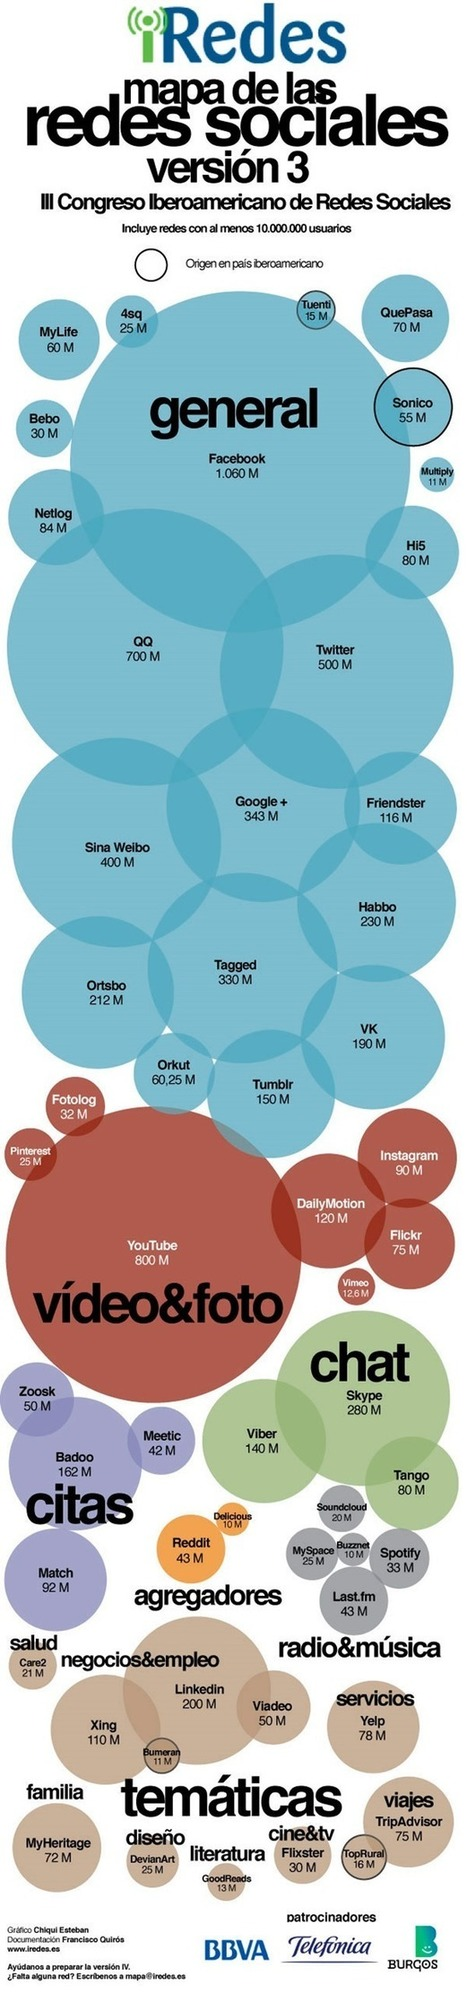 Mapa de las redes sociales en Iberoamerica | TICs | Scoop.it